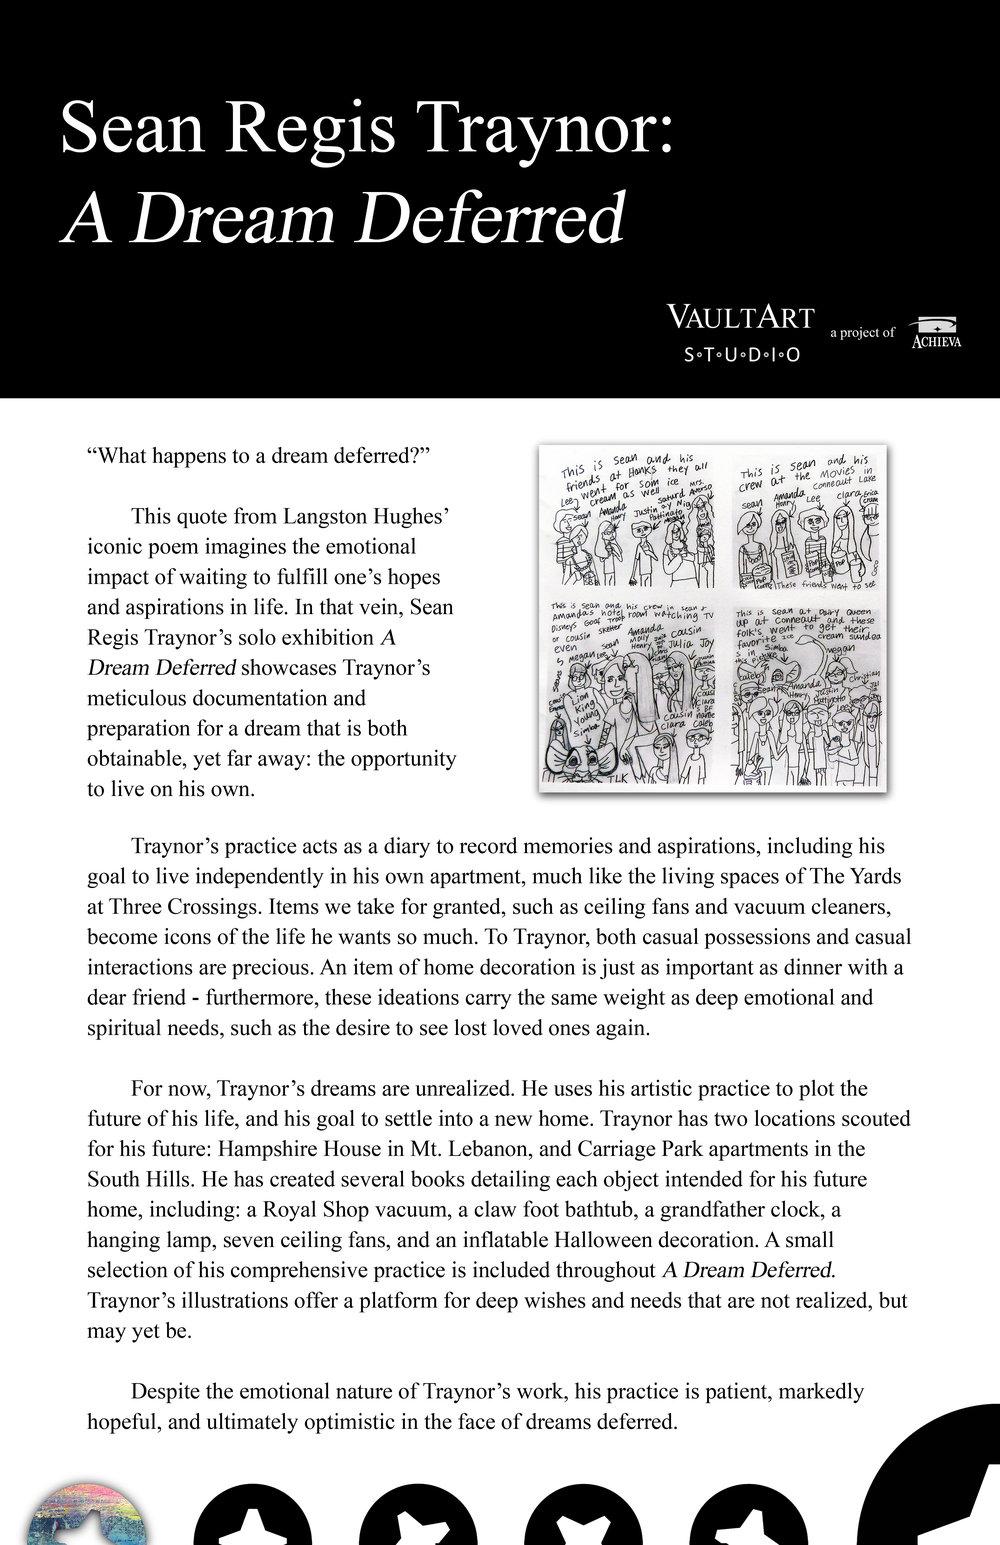 VaultArt Oxford Poster Sean Curatorial Writeup.jpg